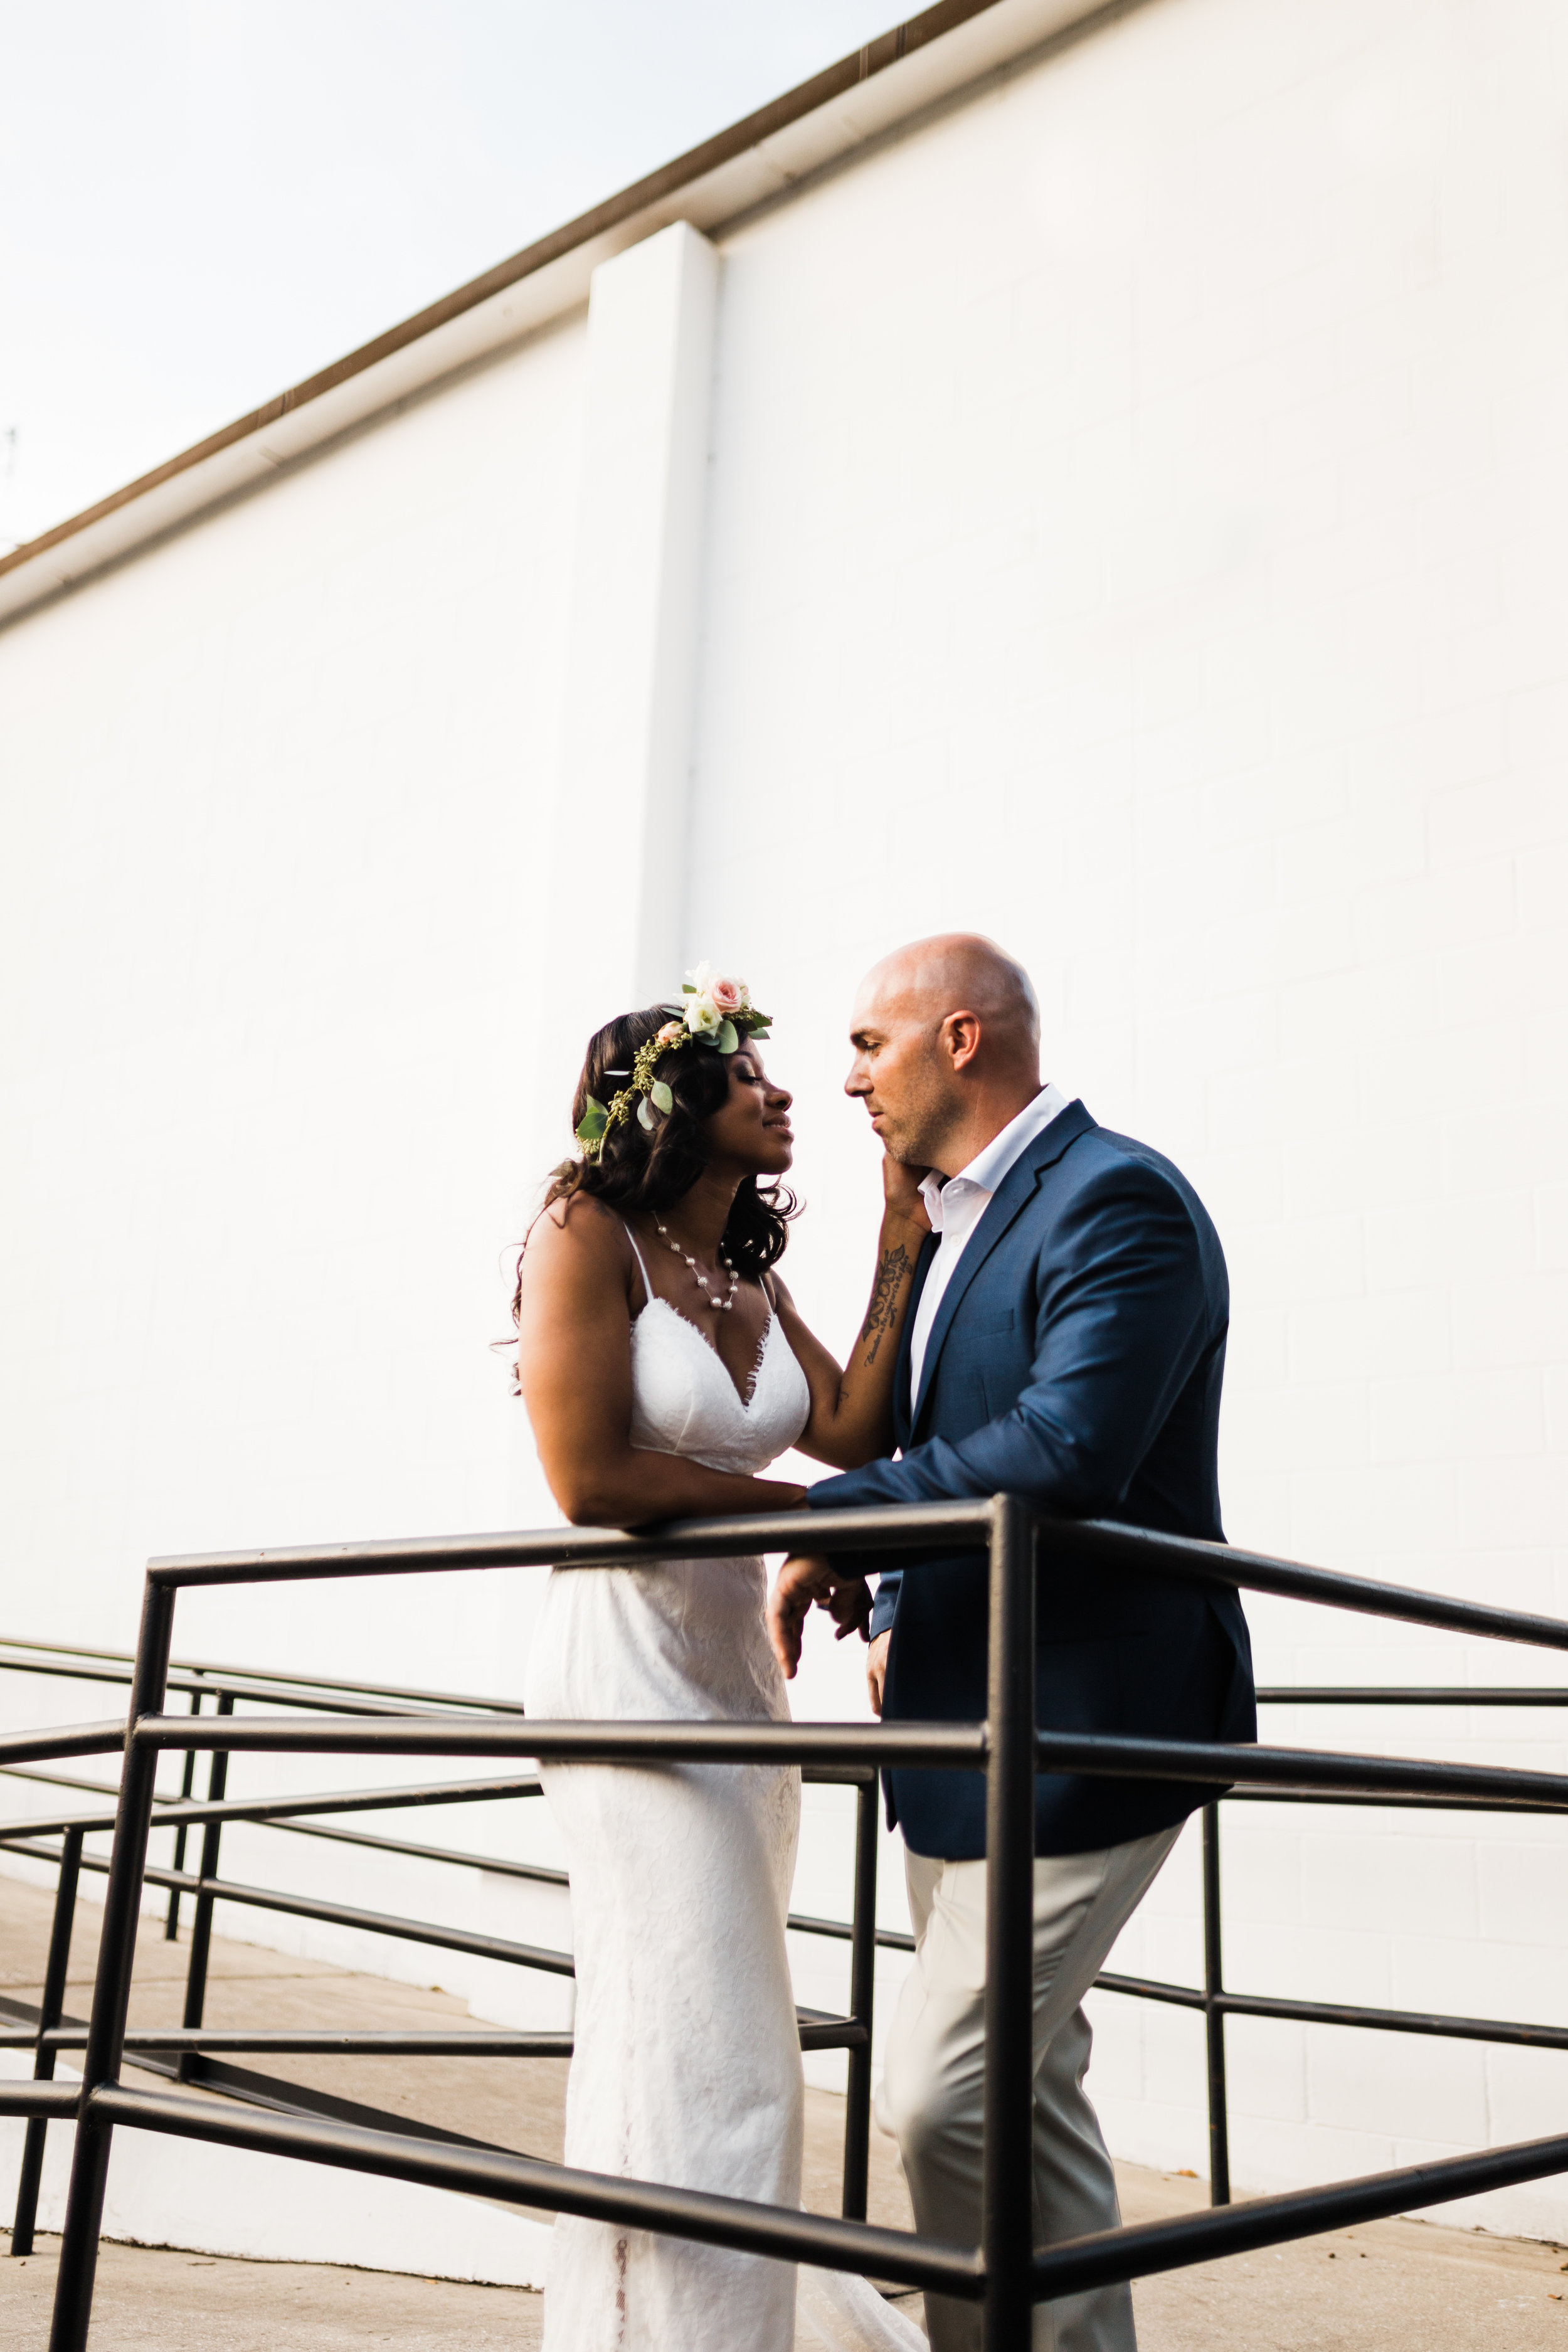 2017.09.16 Ashley and Chuck O'Day Quantam Leap Winery Wedding (441 of 462).jpg